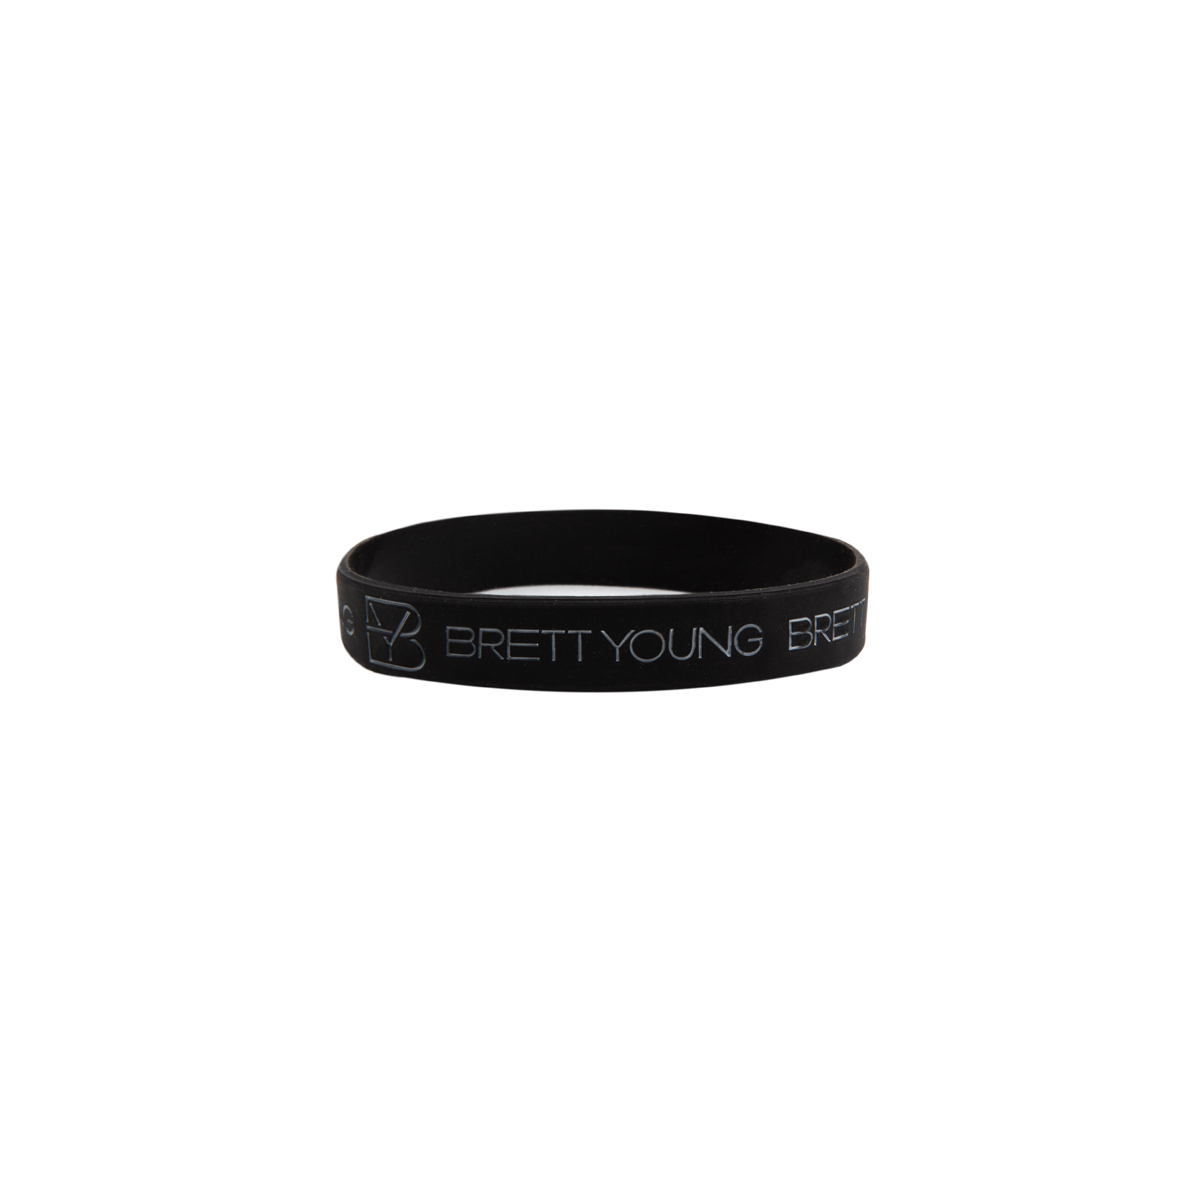 Brett Young Logo Wristband